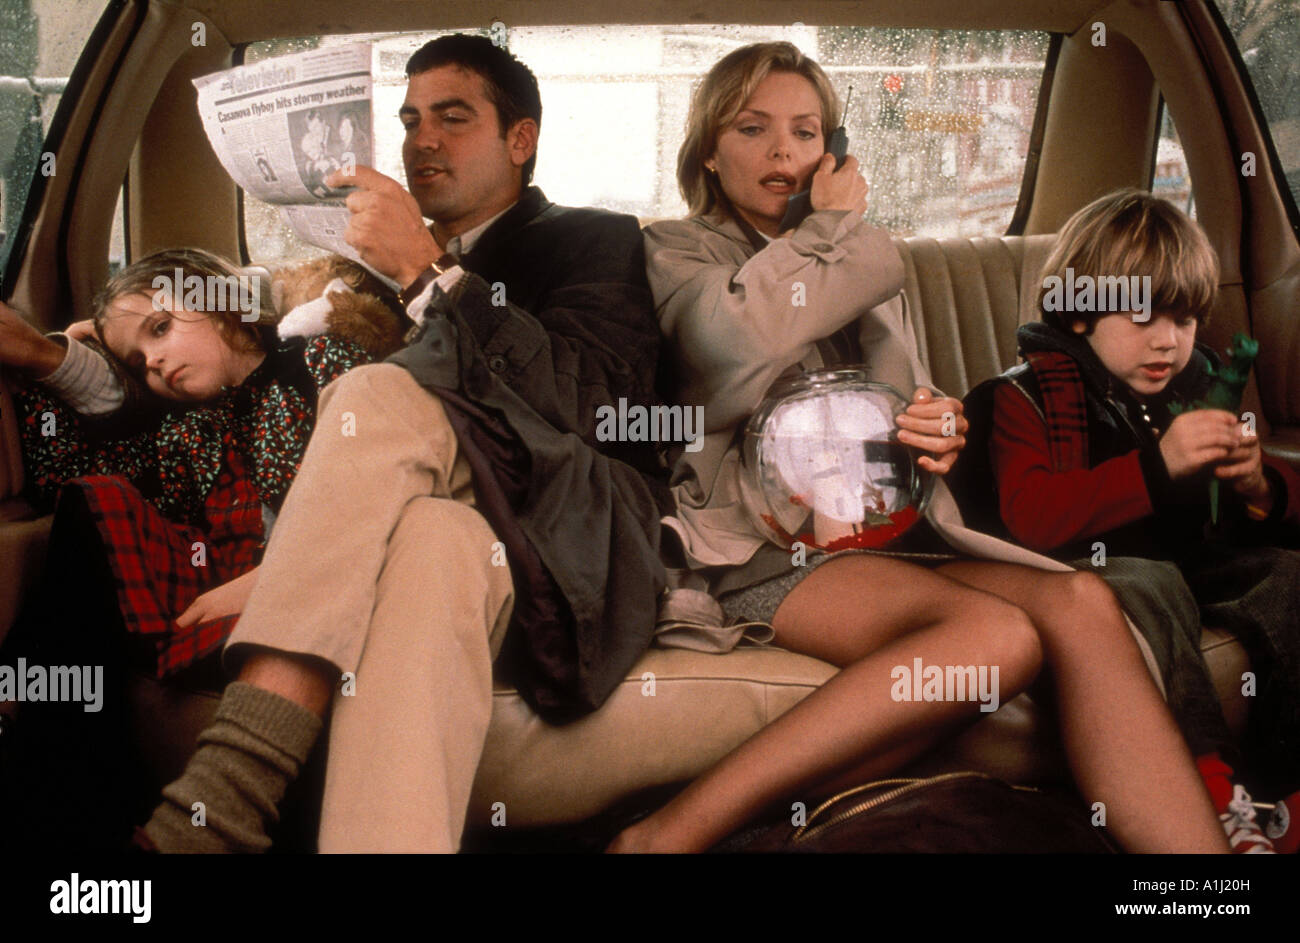 One Fine Day Year 1996 Director Michael Hoffman Michelle Pfeiffer Alex D Linz George Clooney Mae Whitman Stock Photo